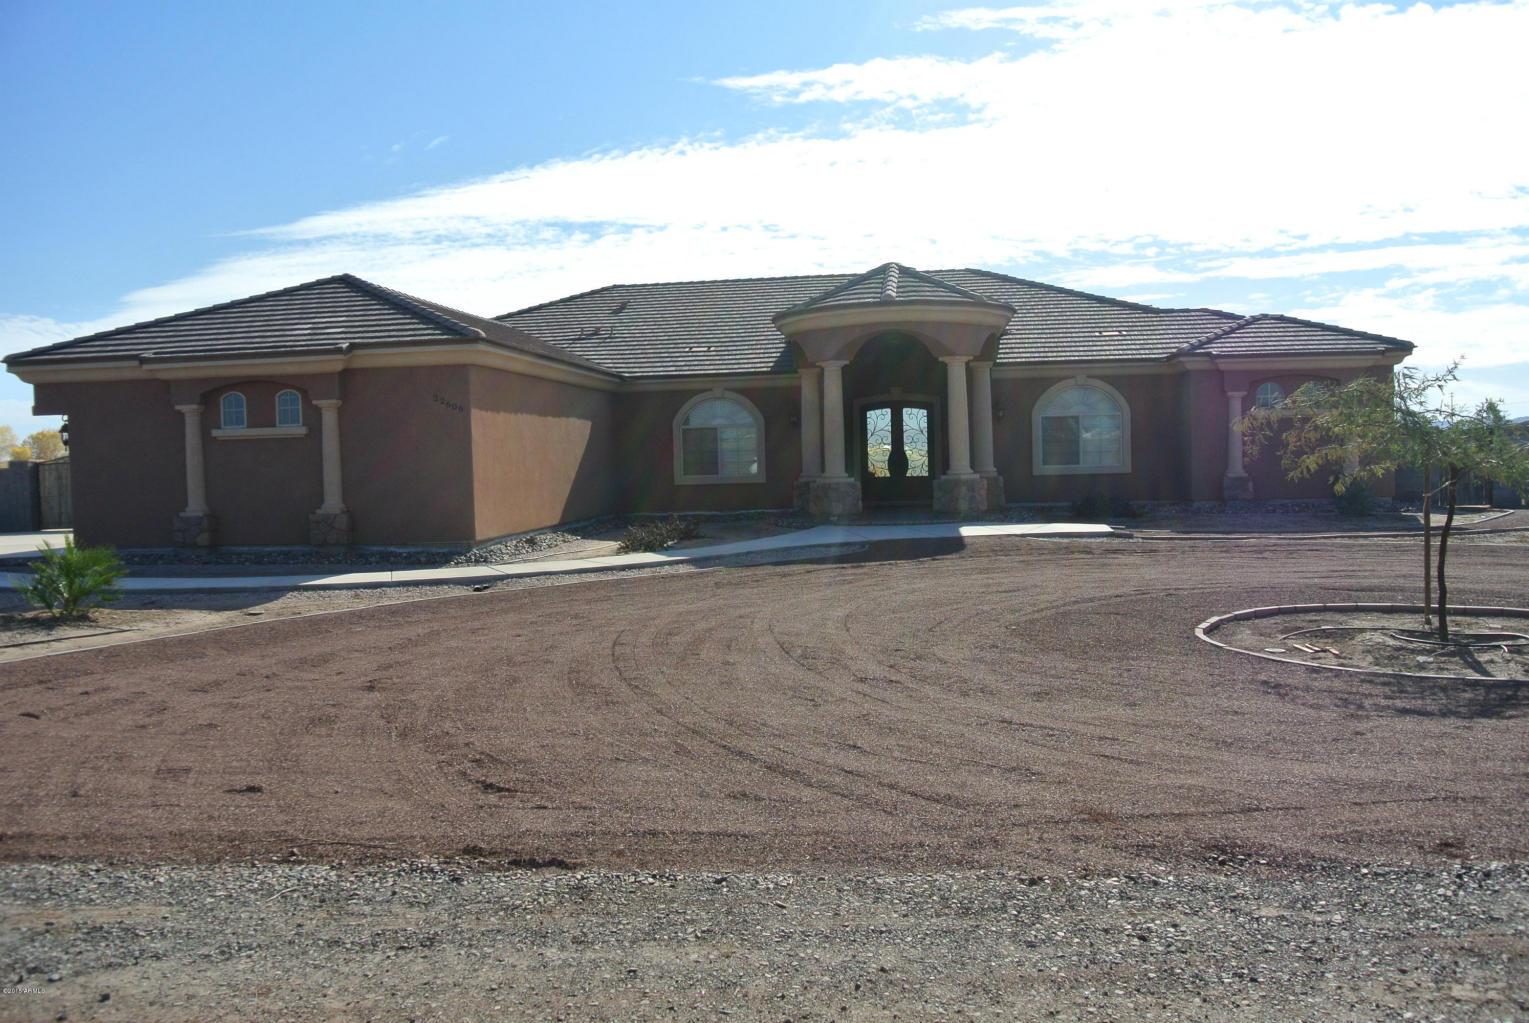 22609 W HARWELL RD, Buckeye, AZ 85326